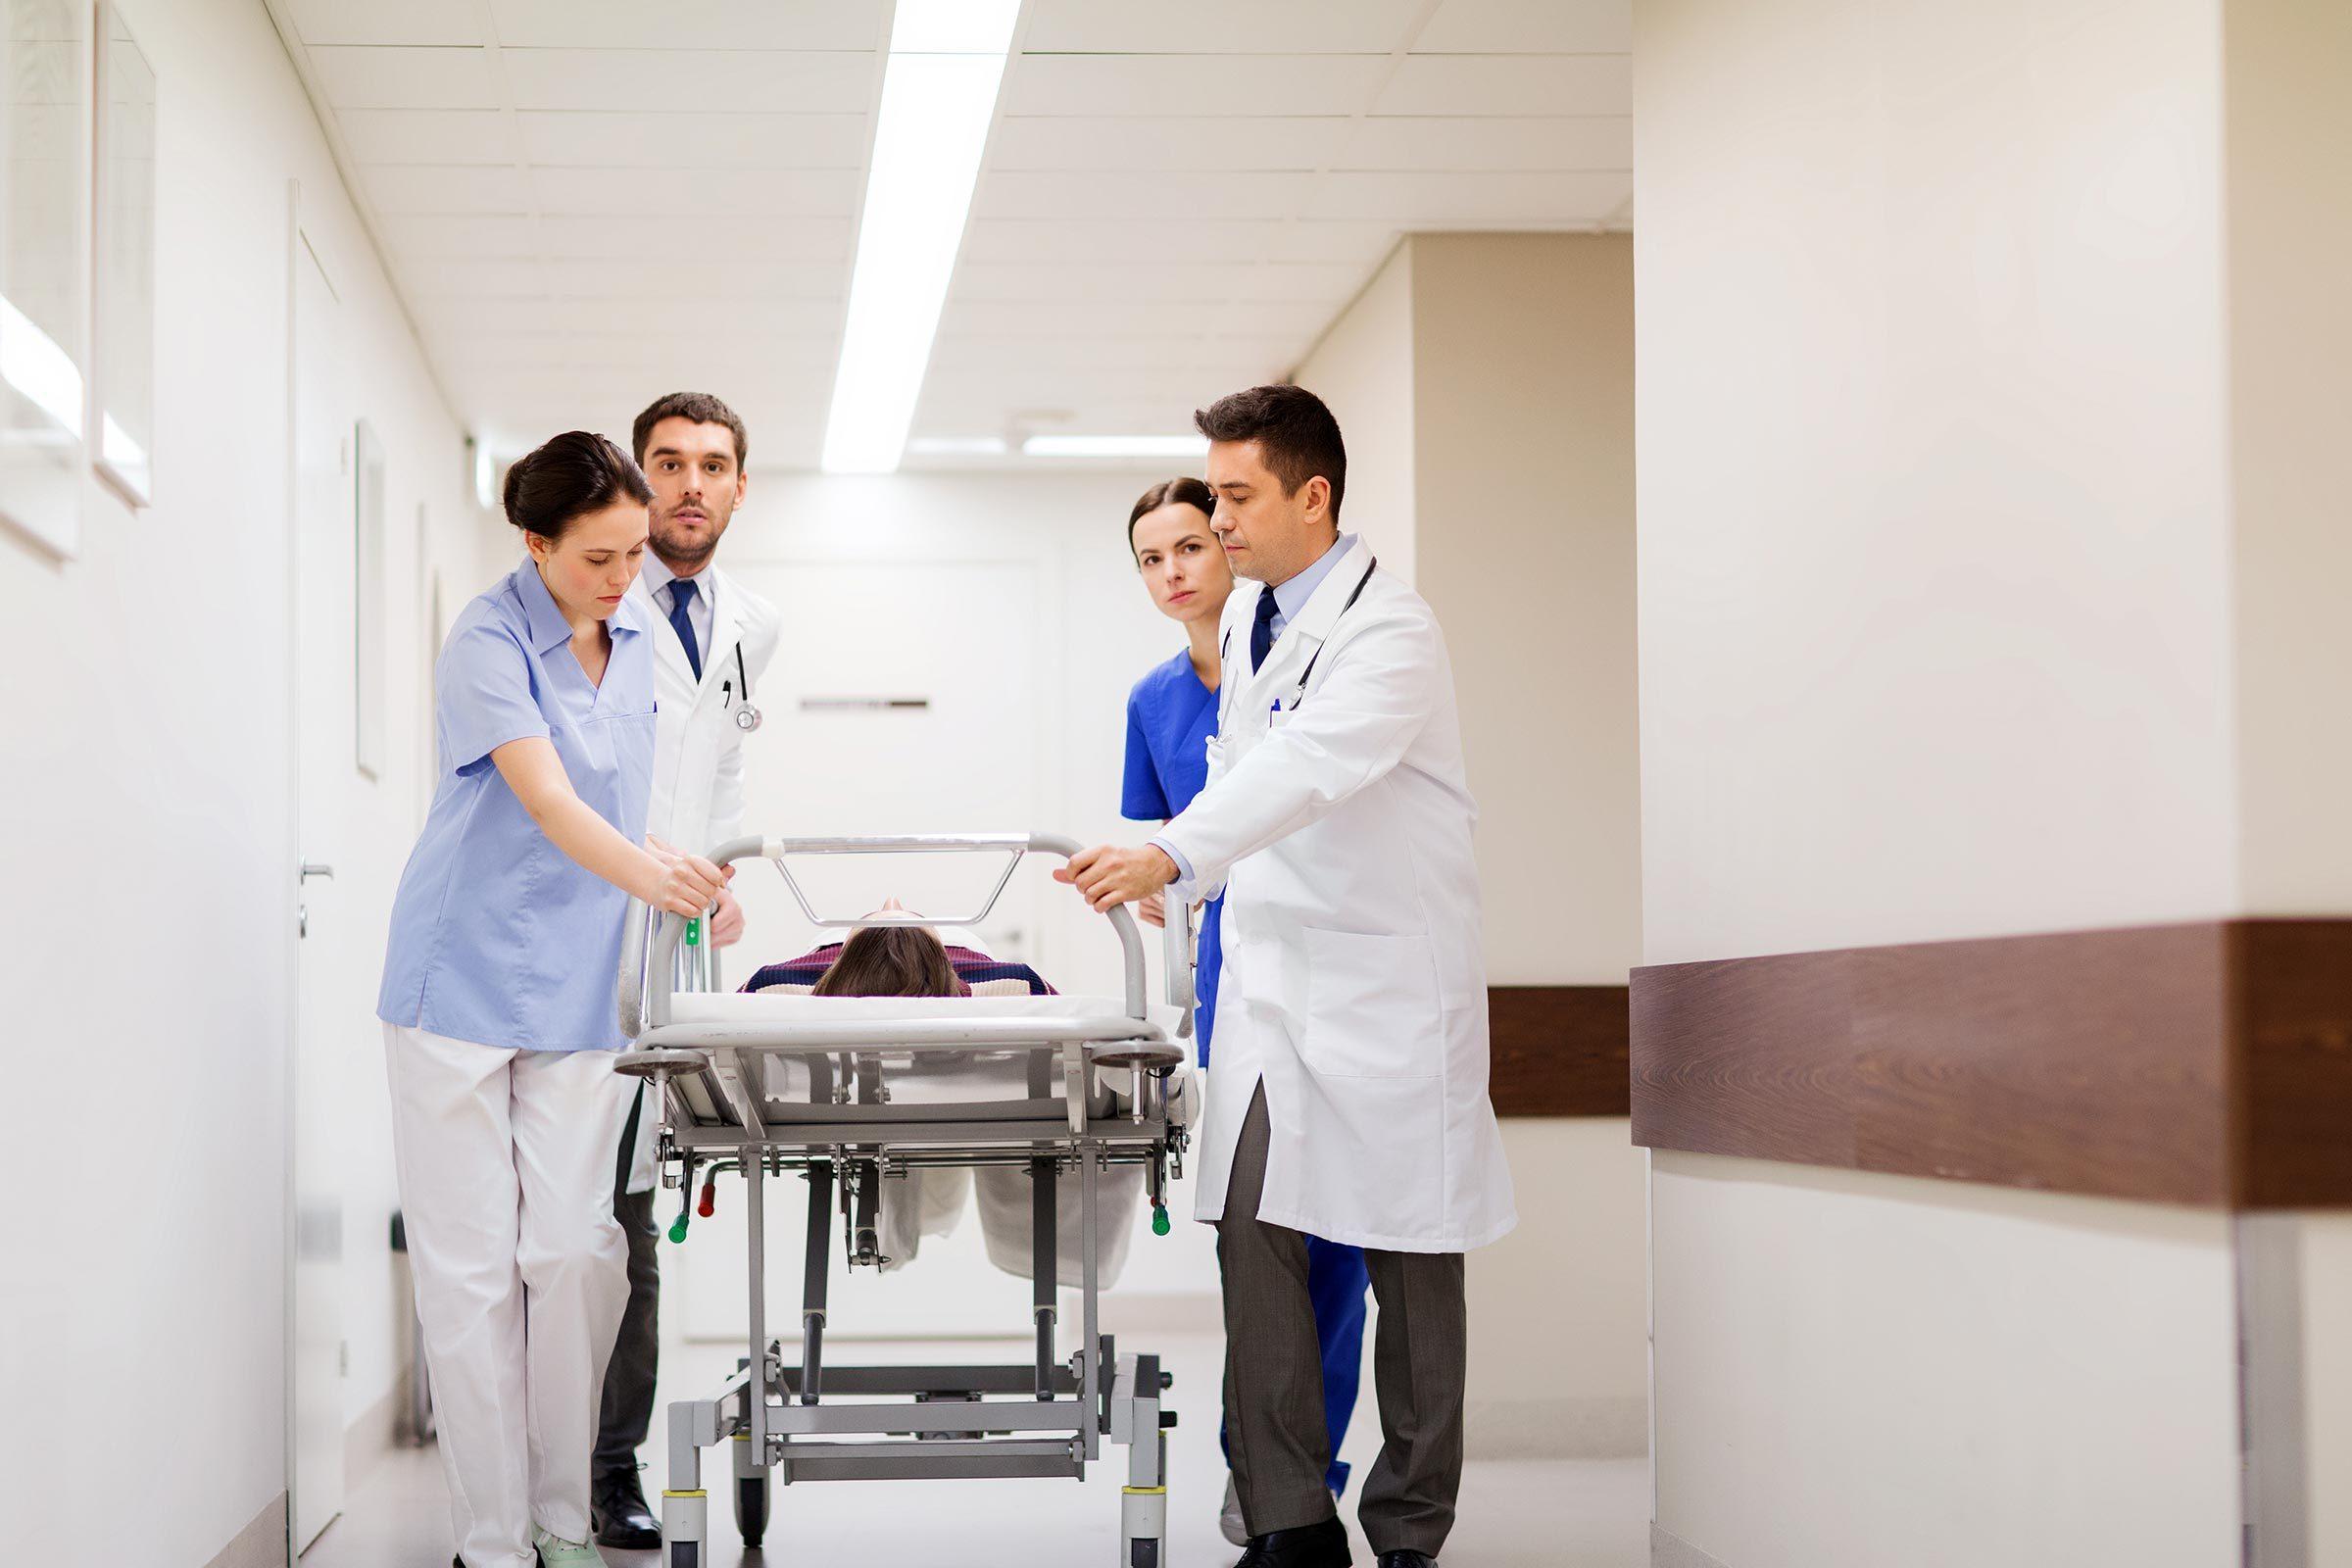 emergency room gurney